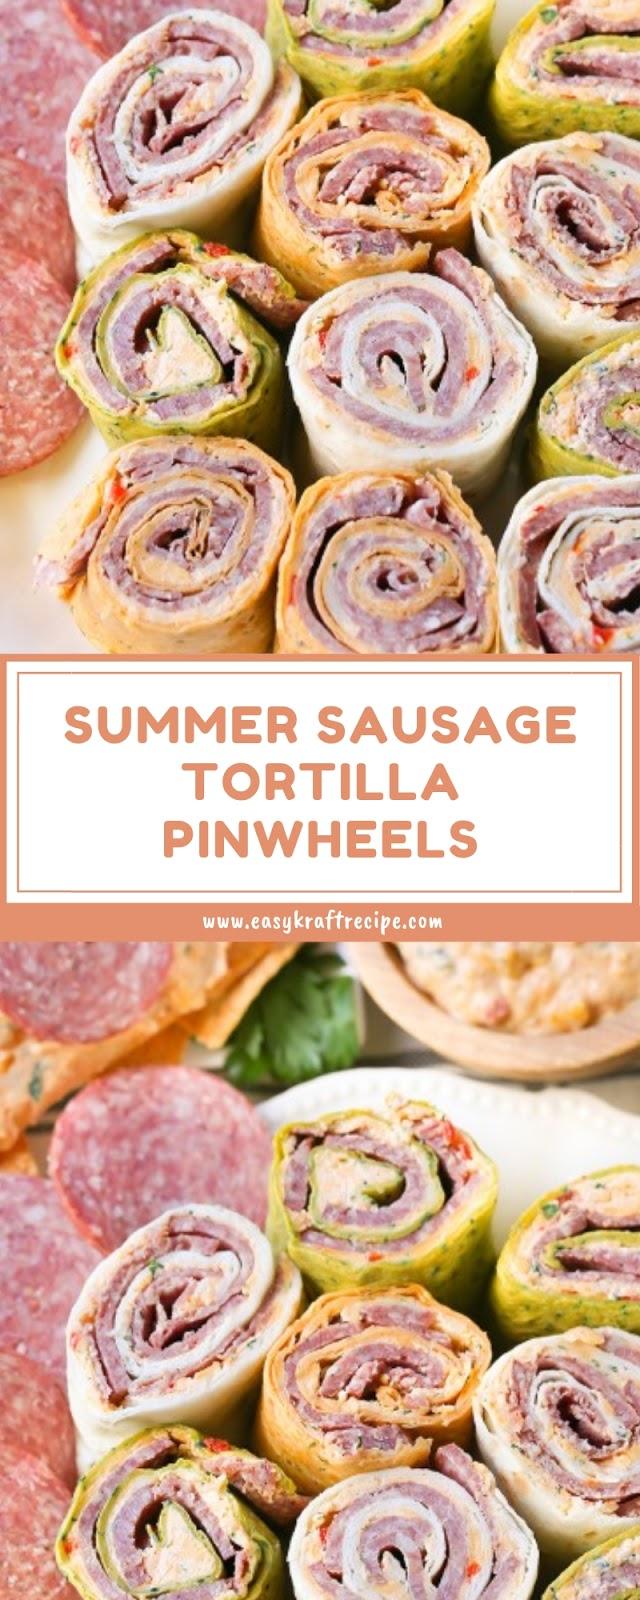 SUMMER SAUSAGE TORTILLA PINWHEELS